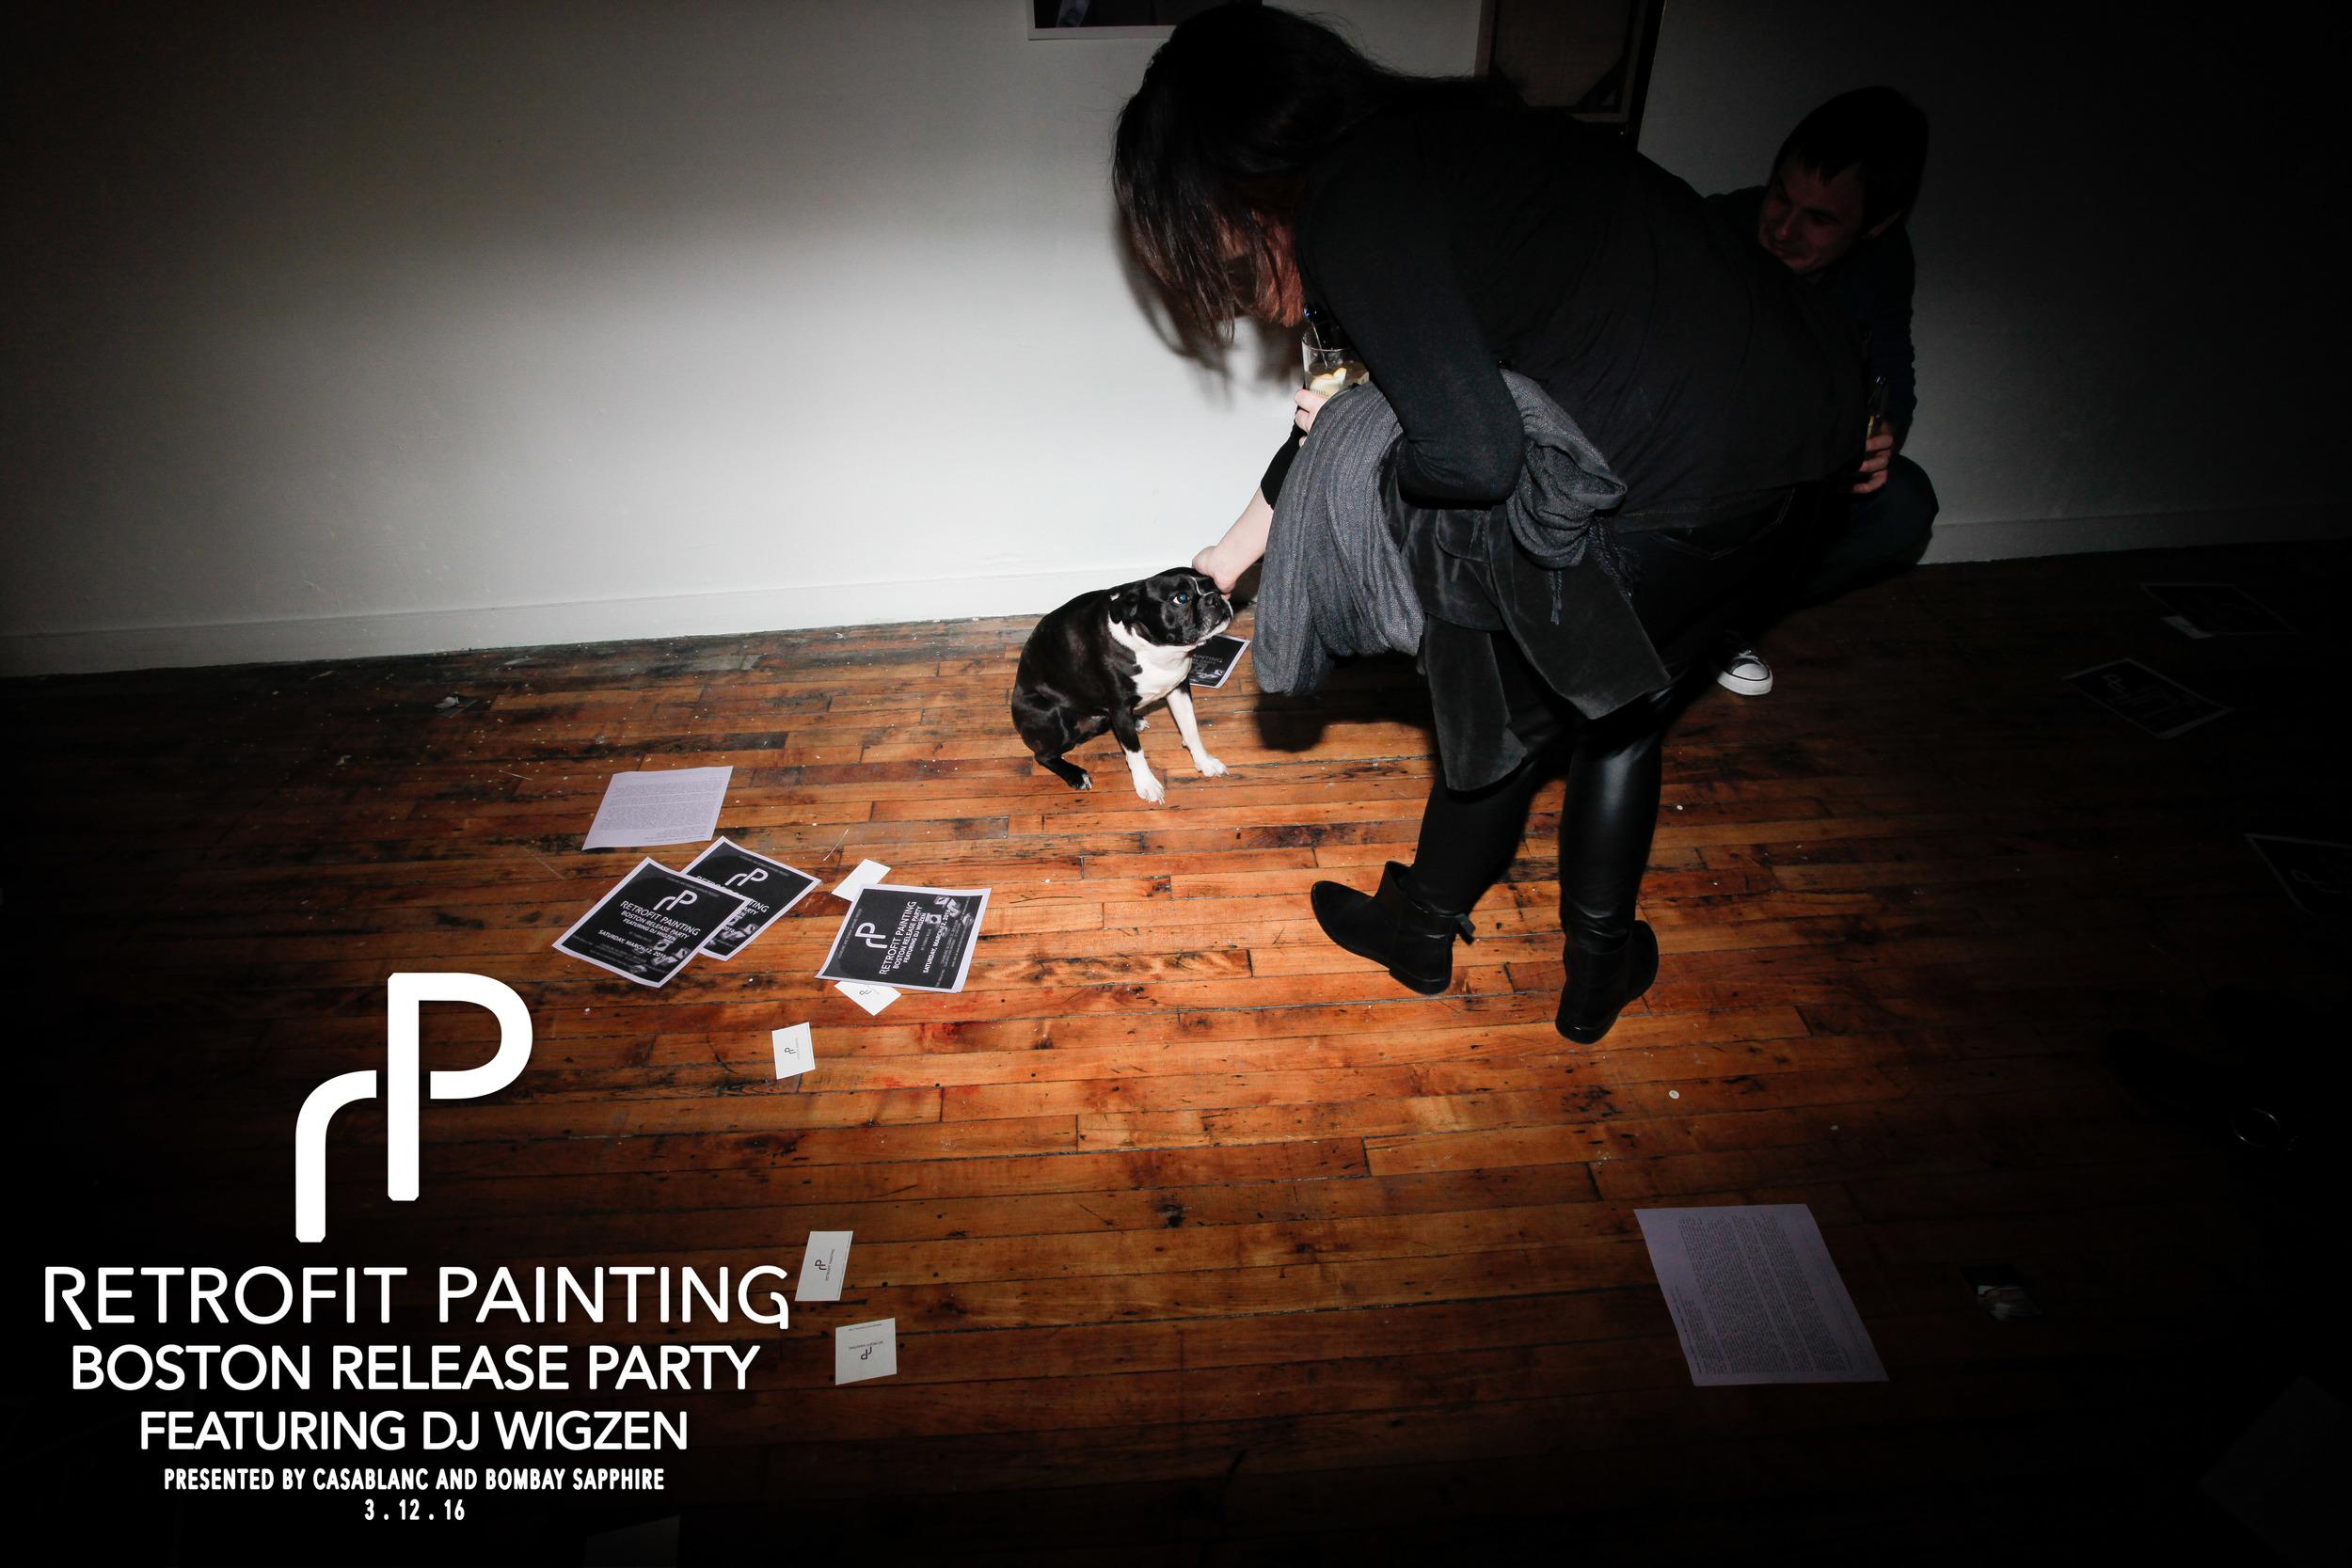 Retrofit Painting Boston Release Party 0016.jpg